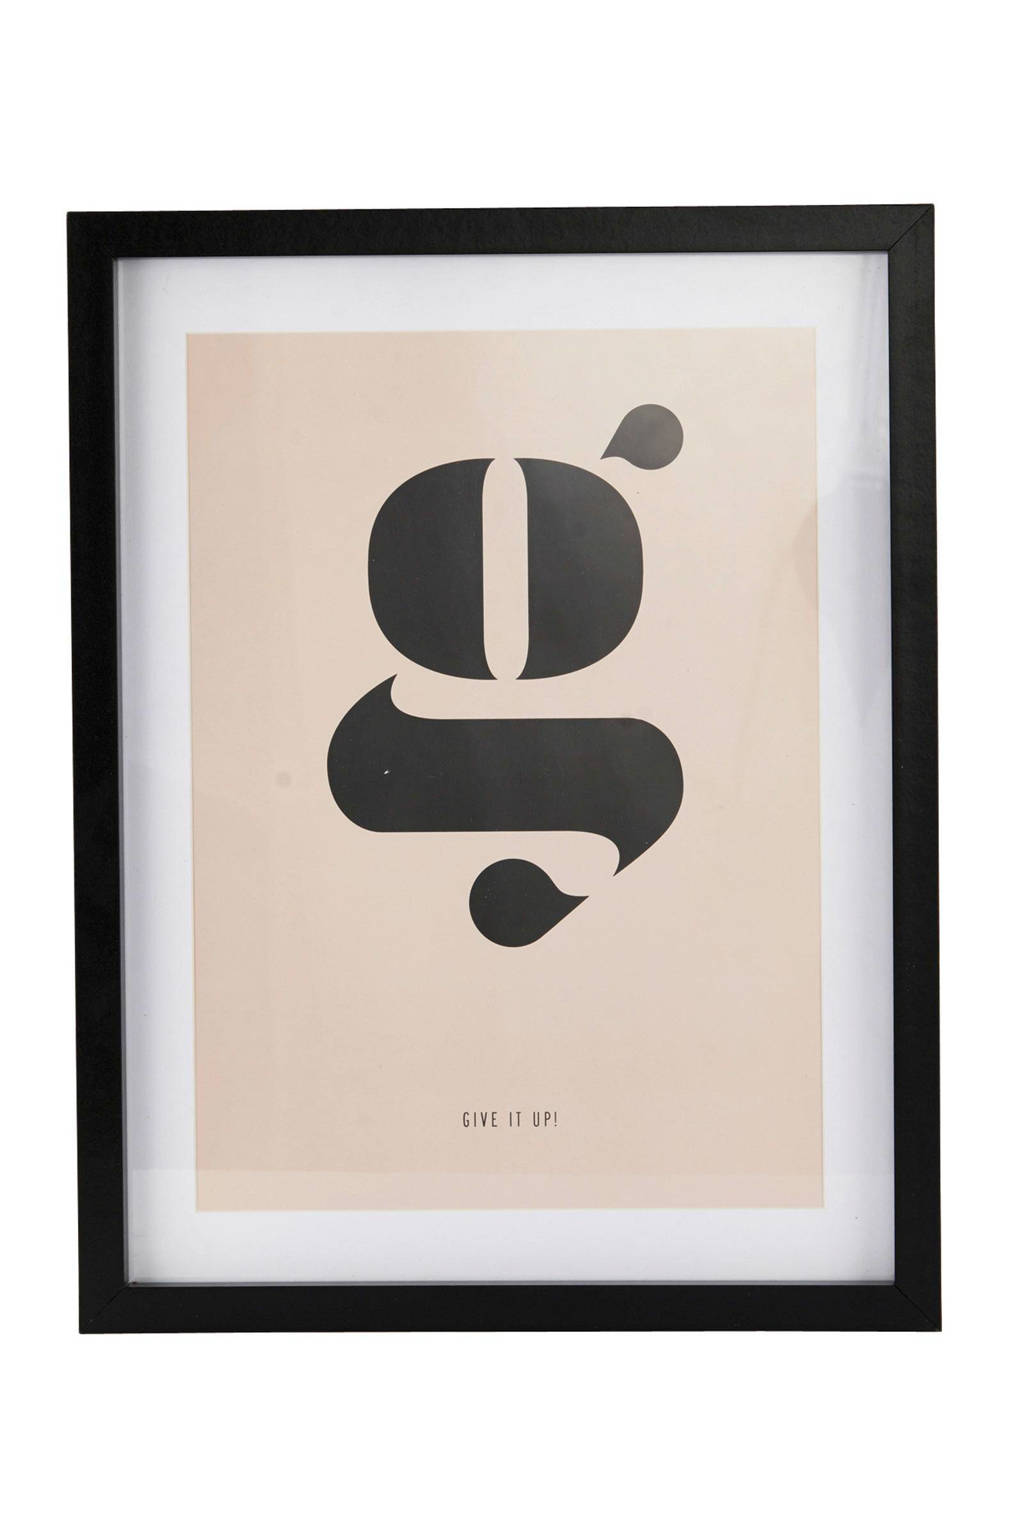 House Doctor wanddecoratie (25x20 cm), Wit/lichtgroen/zwart